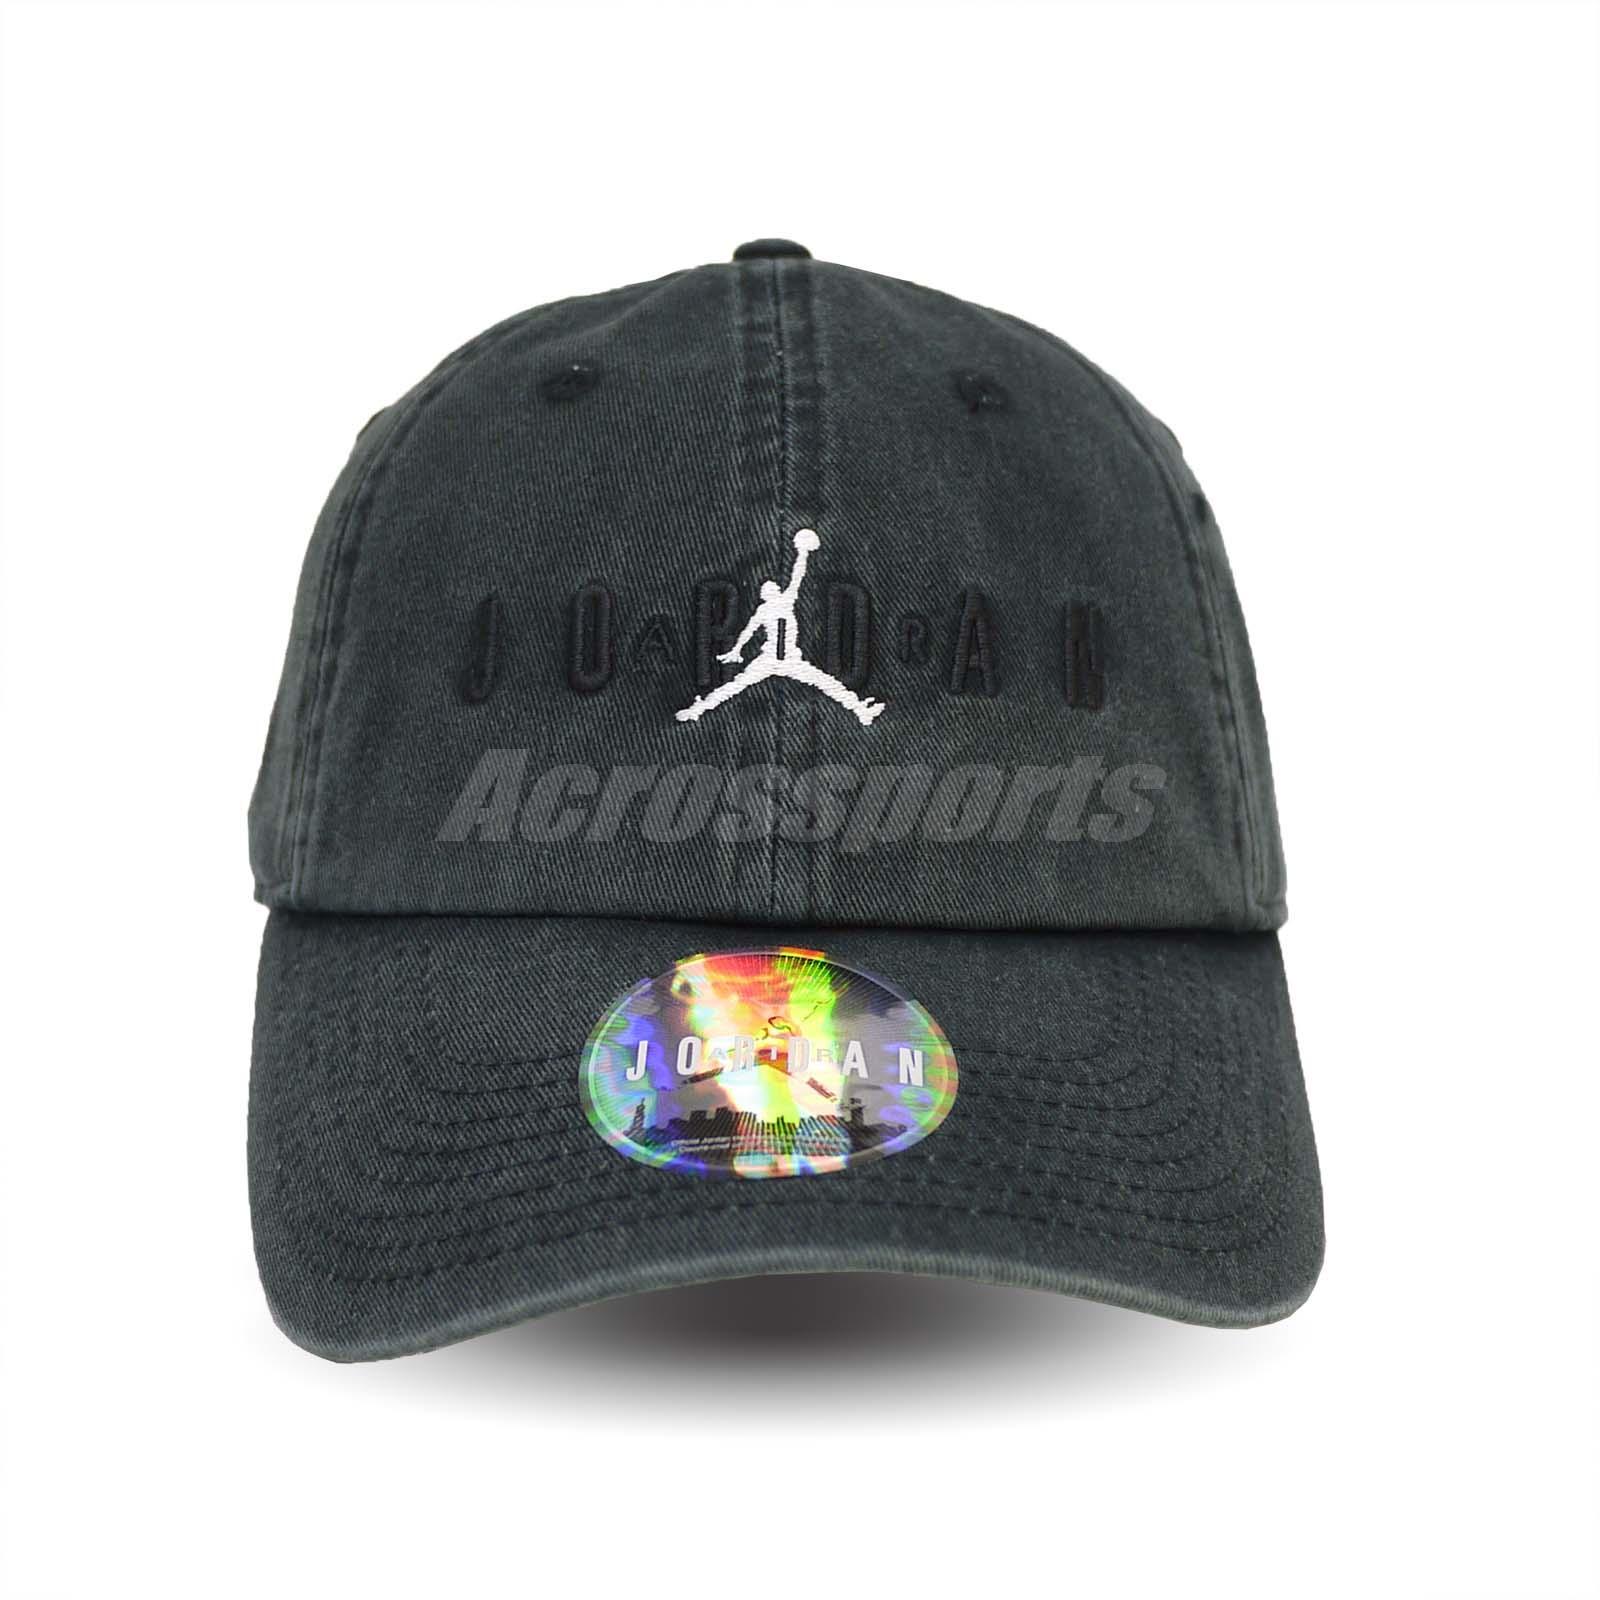 3e6dfd11d53 Nike Jordan Heritage 86 Jumpman Air Cap H86 Hat Sports Washed Black ...